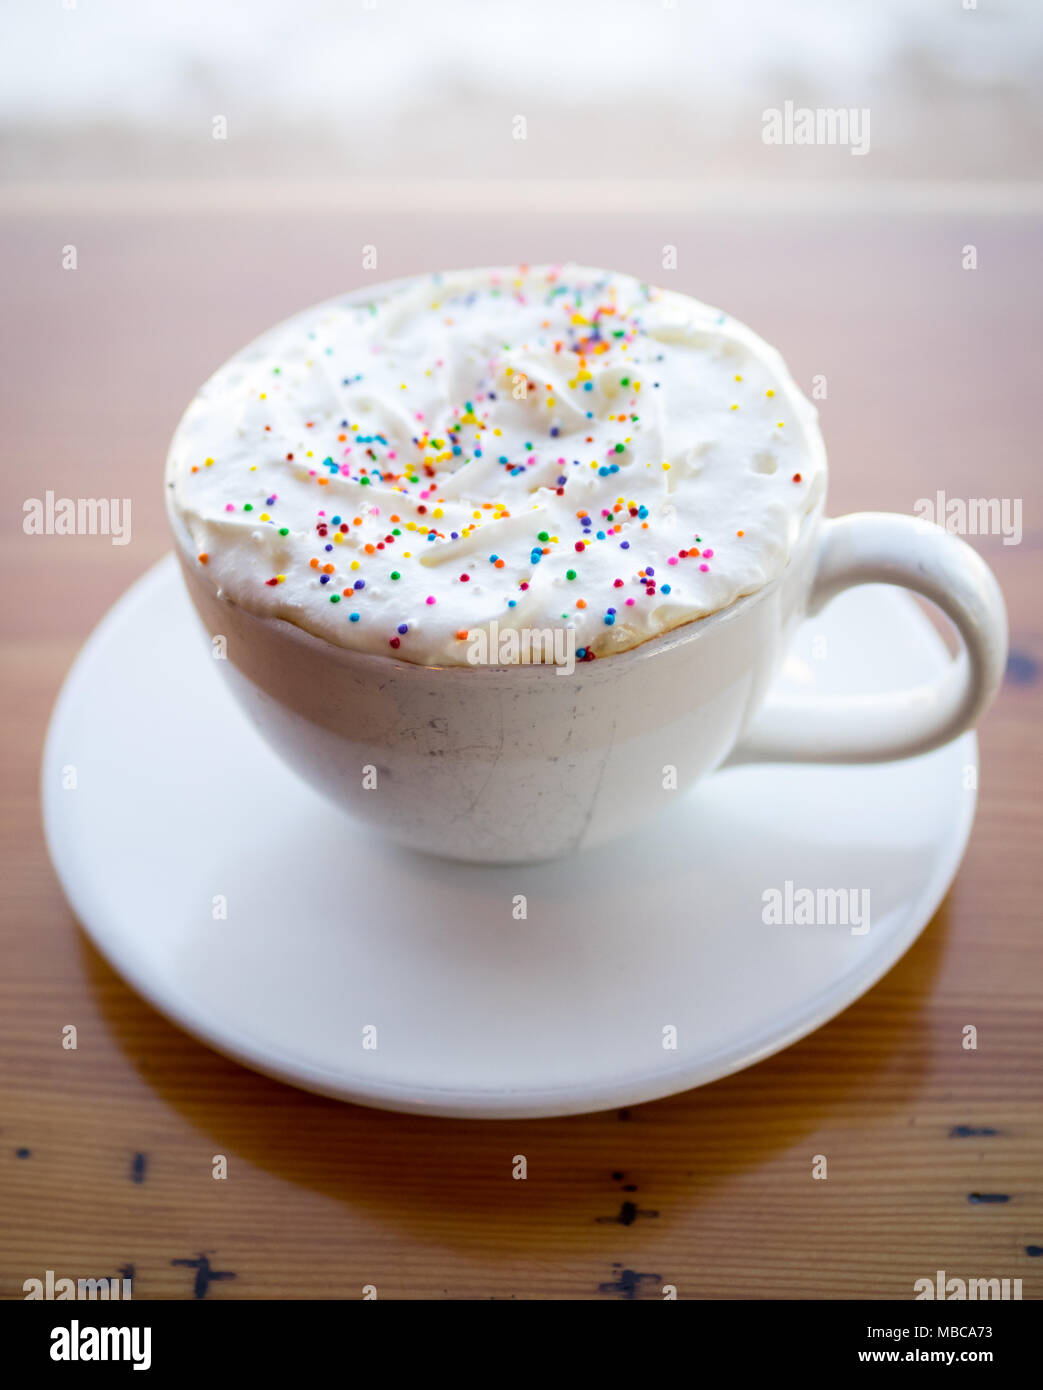 A birthday cake latté from D'lish by Tish Cafe in Saskatoon, Saskatchewan, Canada. - Stock Image